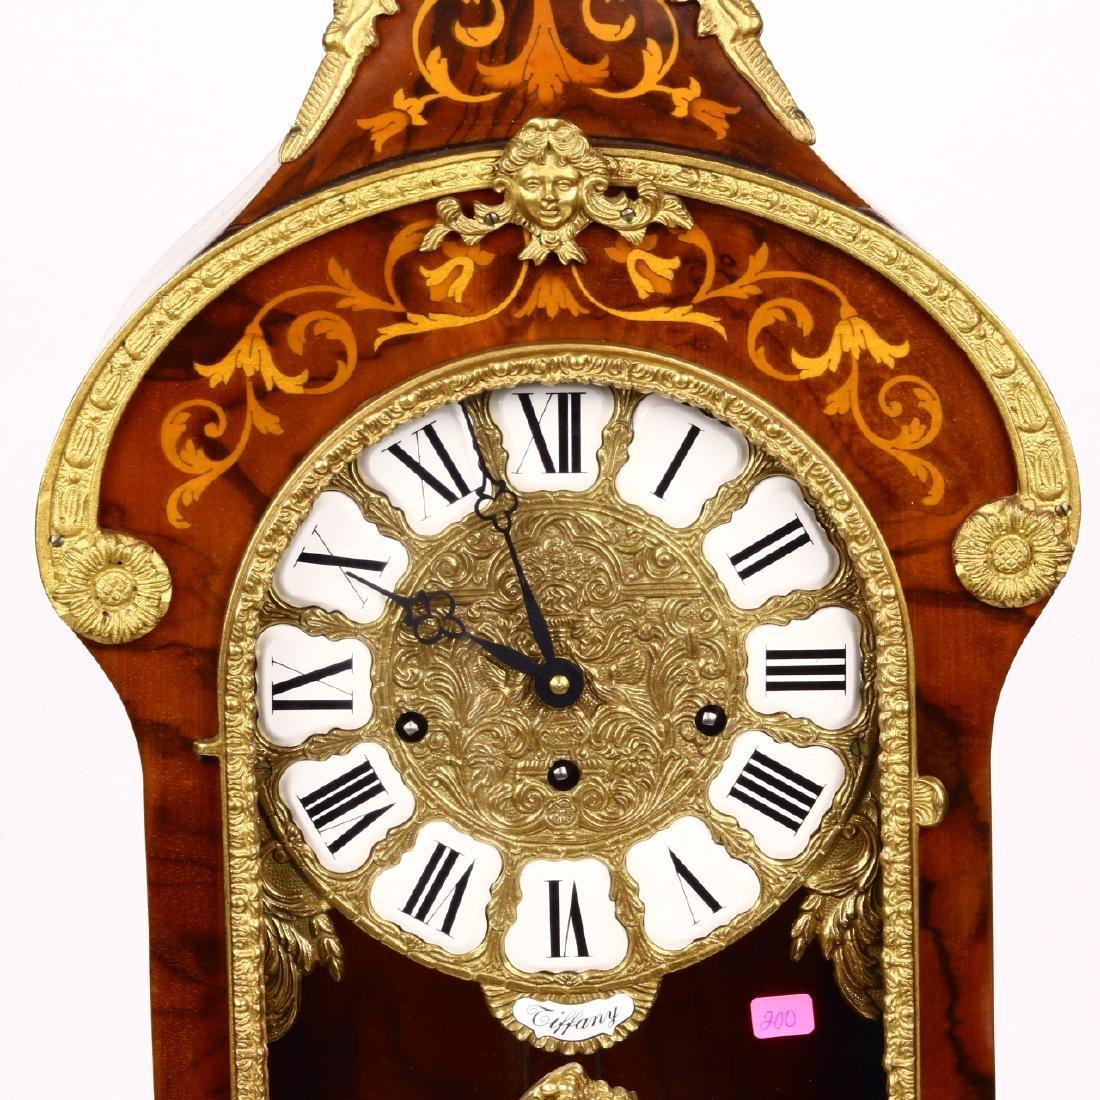 Tiffany Boulle Mantle Clock Brass Ormolu Cherubs Inlaid - 2